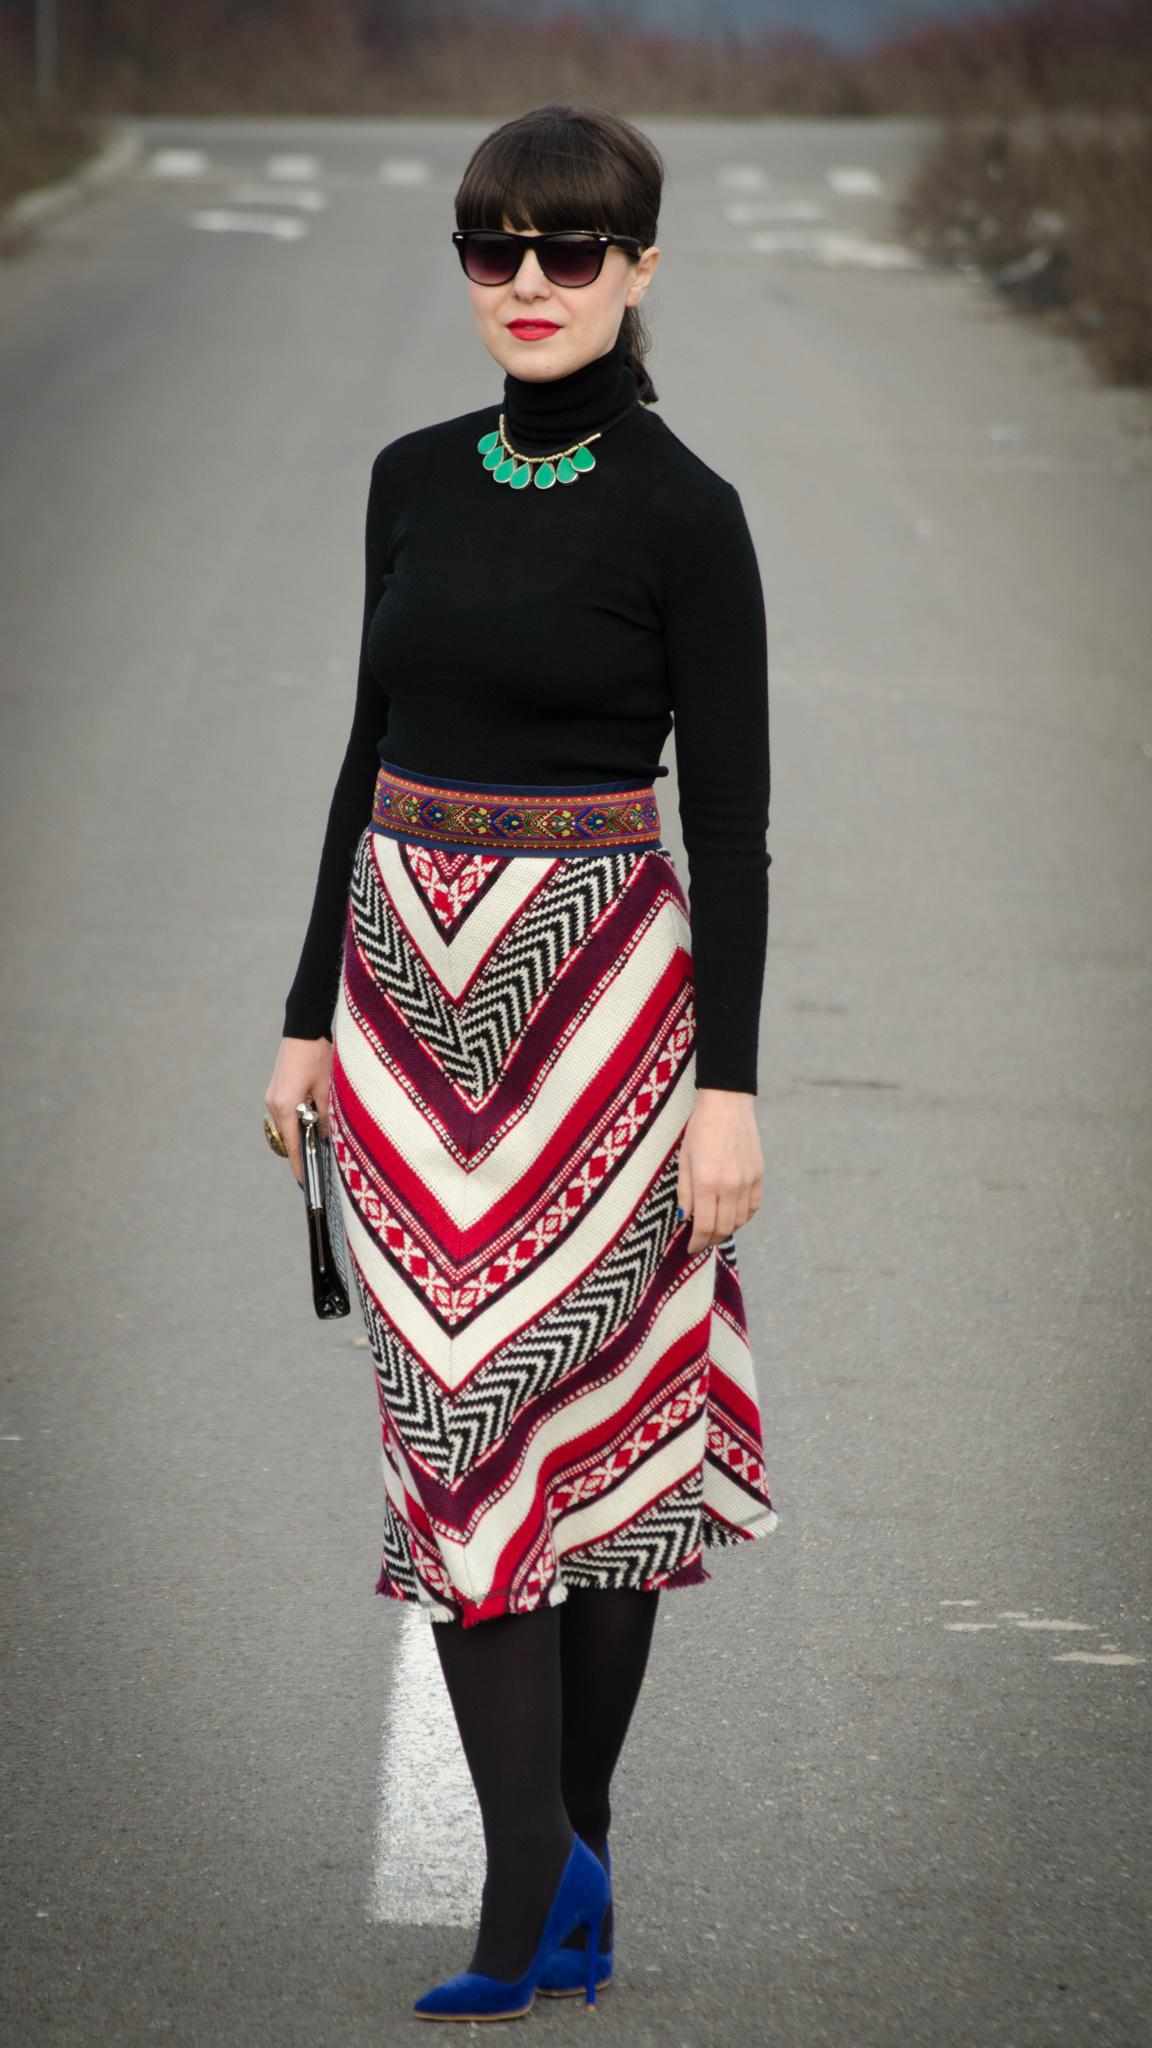 Christmas patterns skirt zara cobalt blue high heels black turtleneck red & green combo clutch statement jewelry romanian traditional waistband